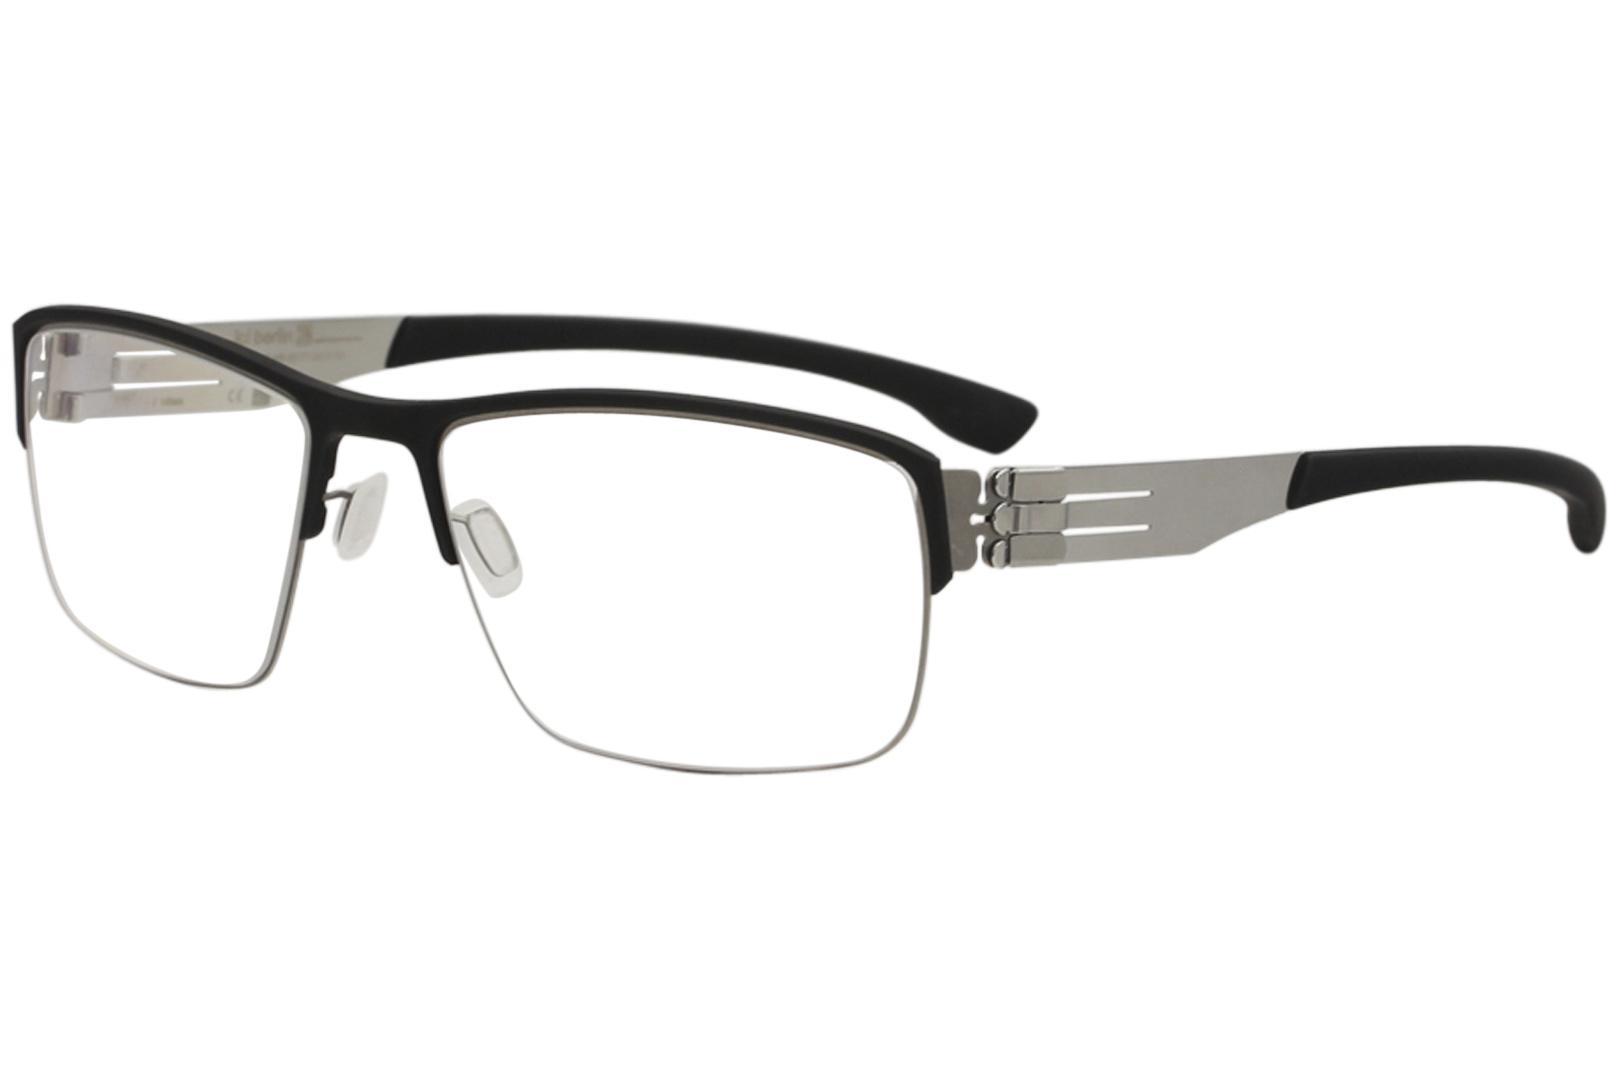 Image of Ic! Berlin Men's Eyeglasses Max S. Full Rim Optical Frame - Black - Lens 54 Bridge 19 Temple 145mm